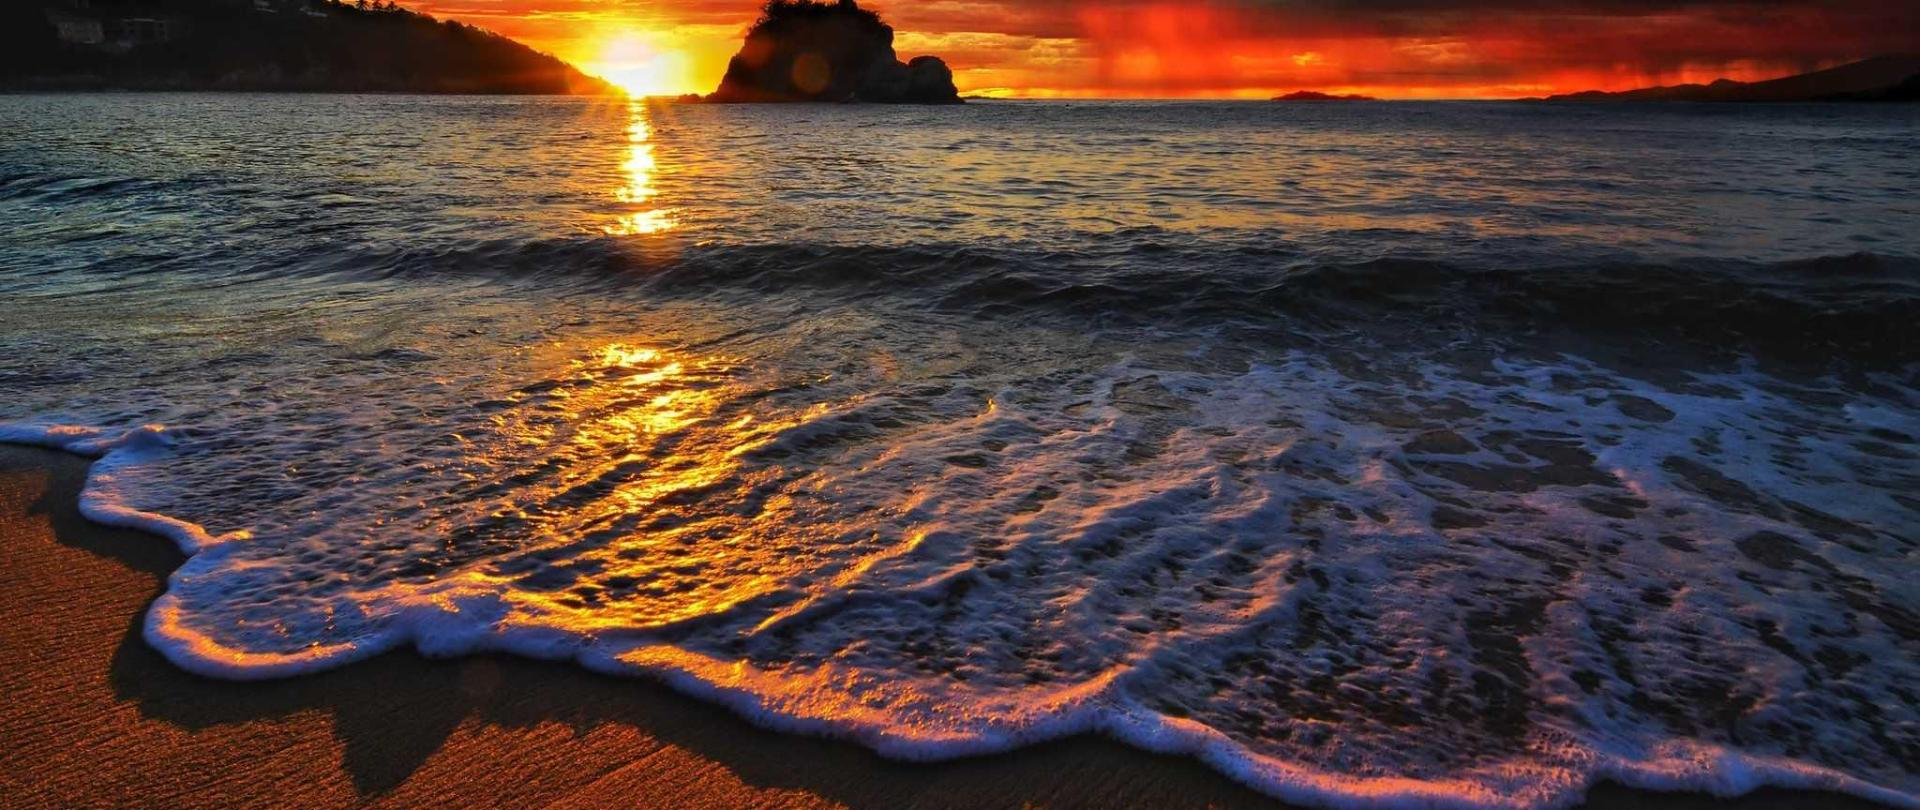 praia54344.jpg